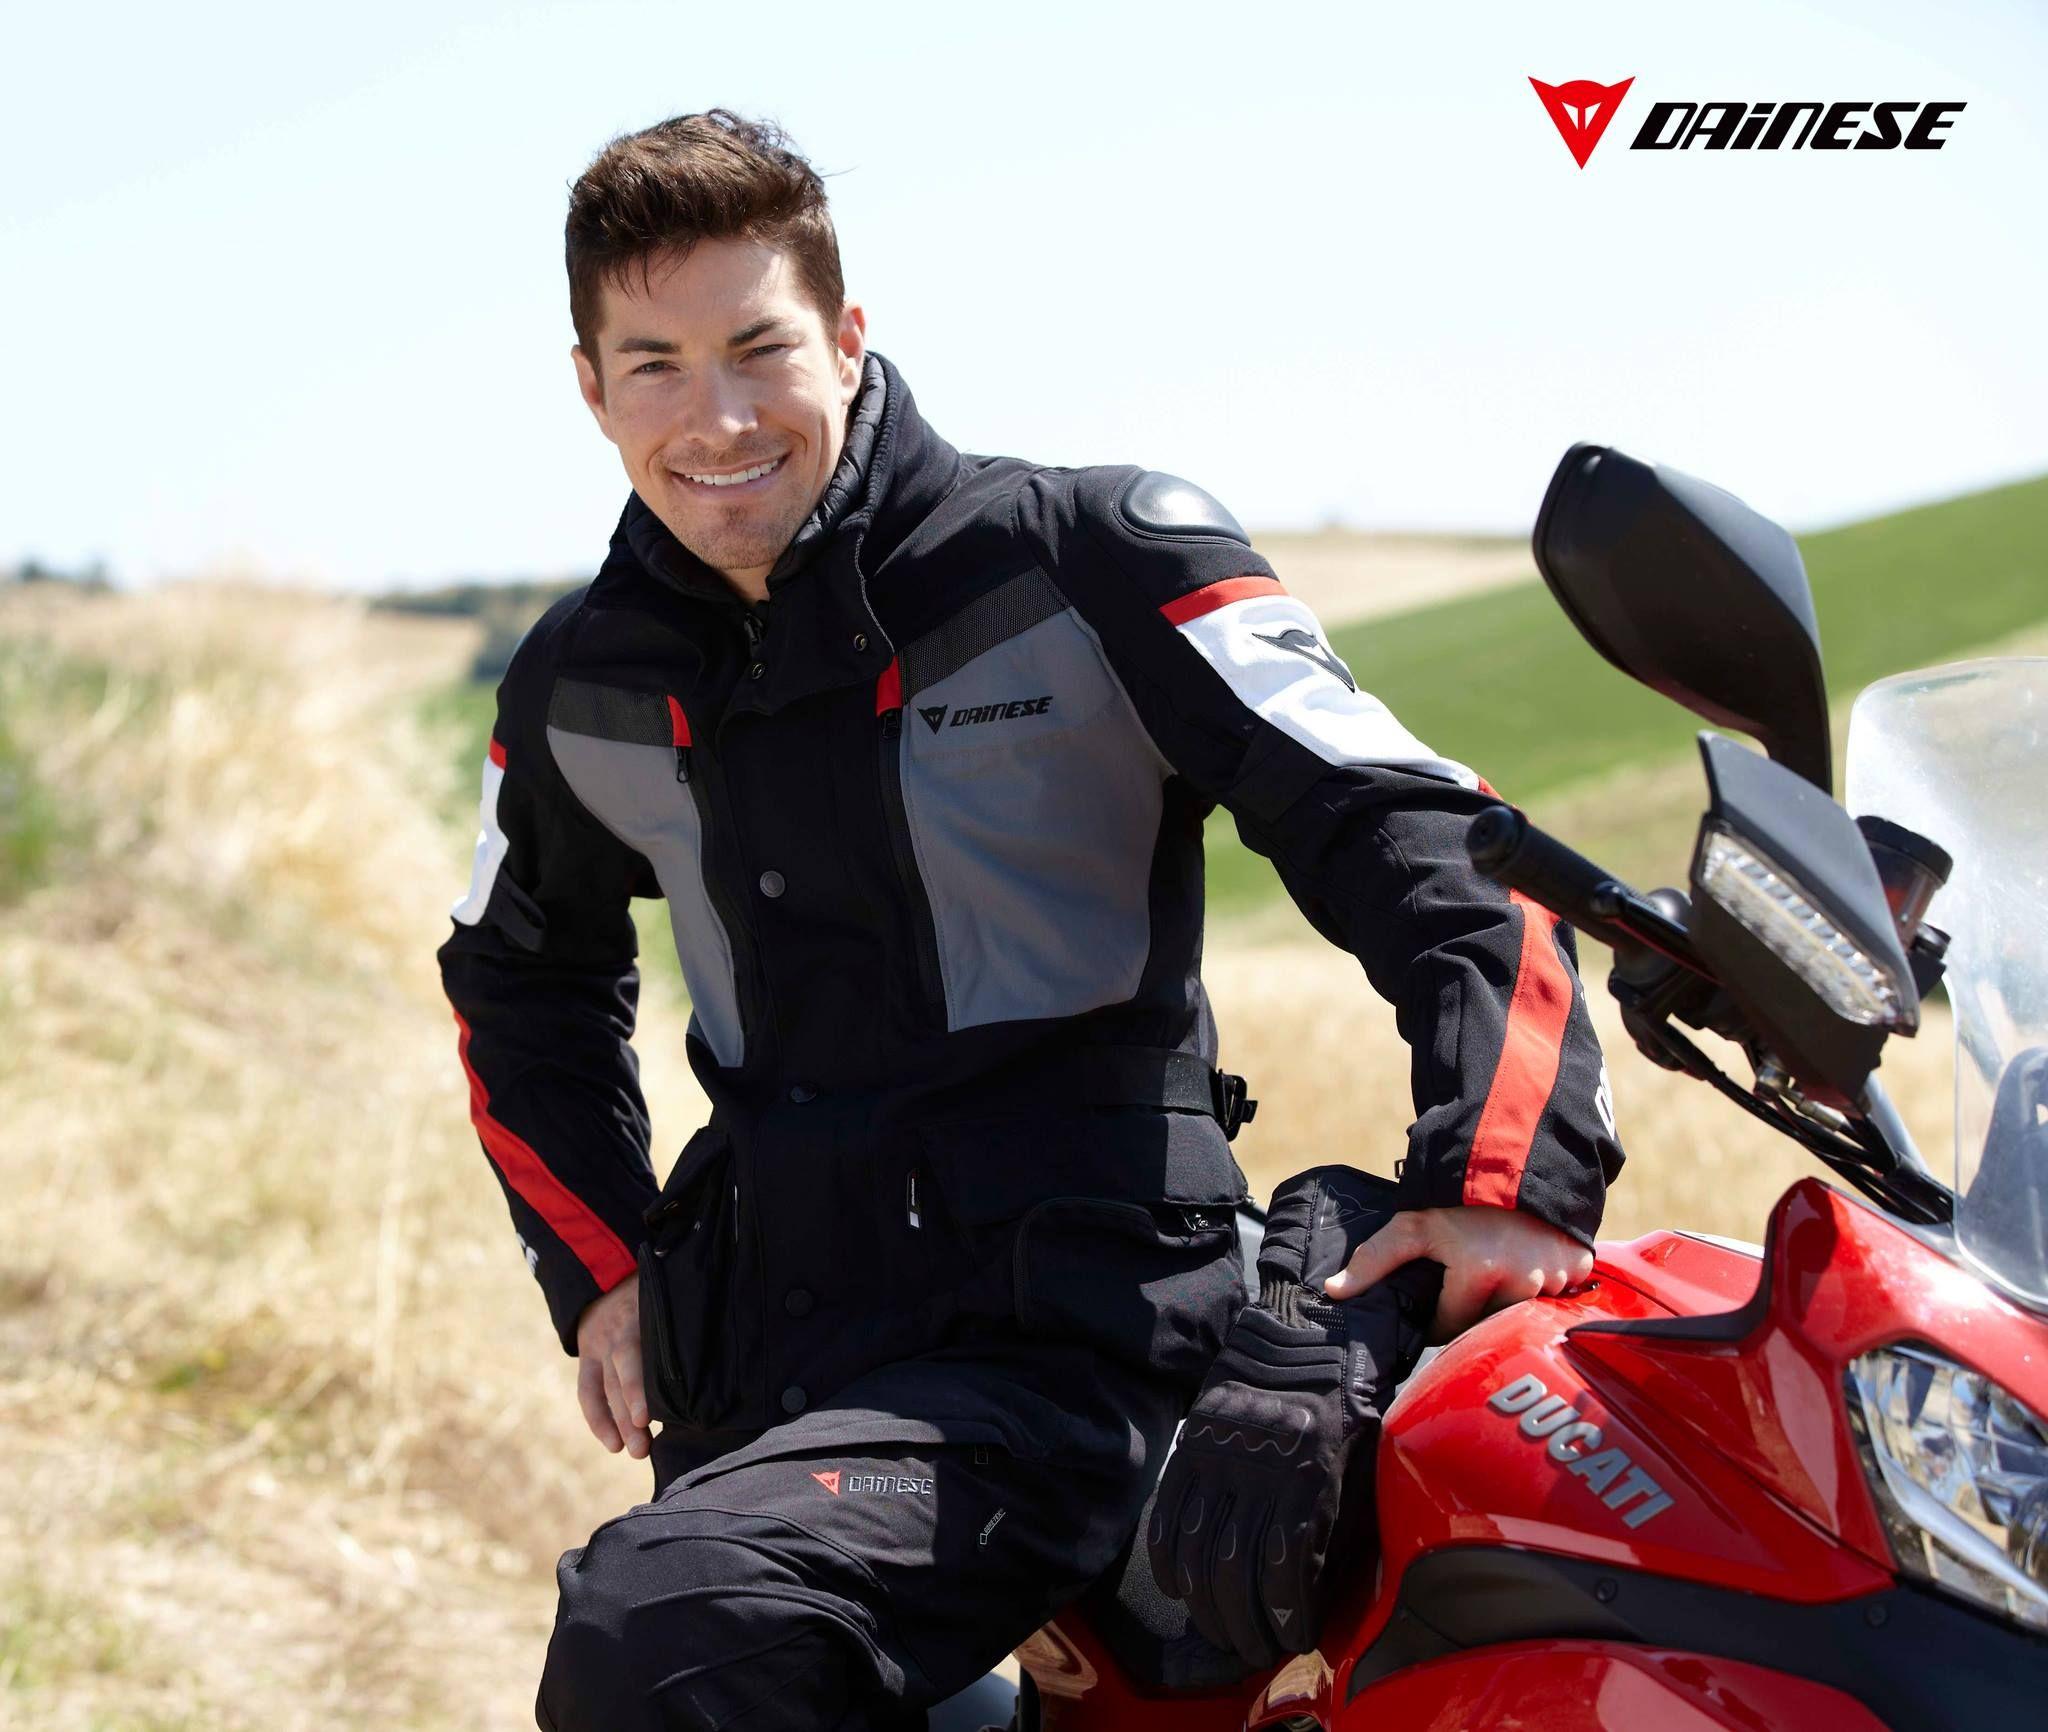 Dainese dealer motorkleding en motorlaarzen